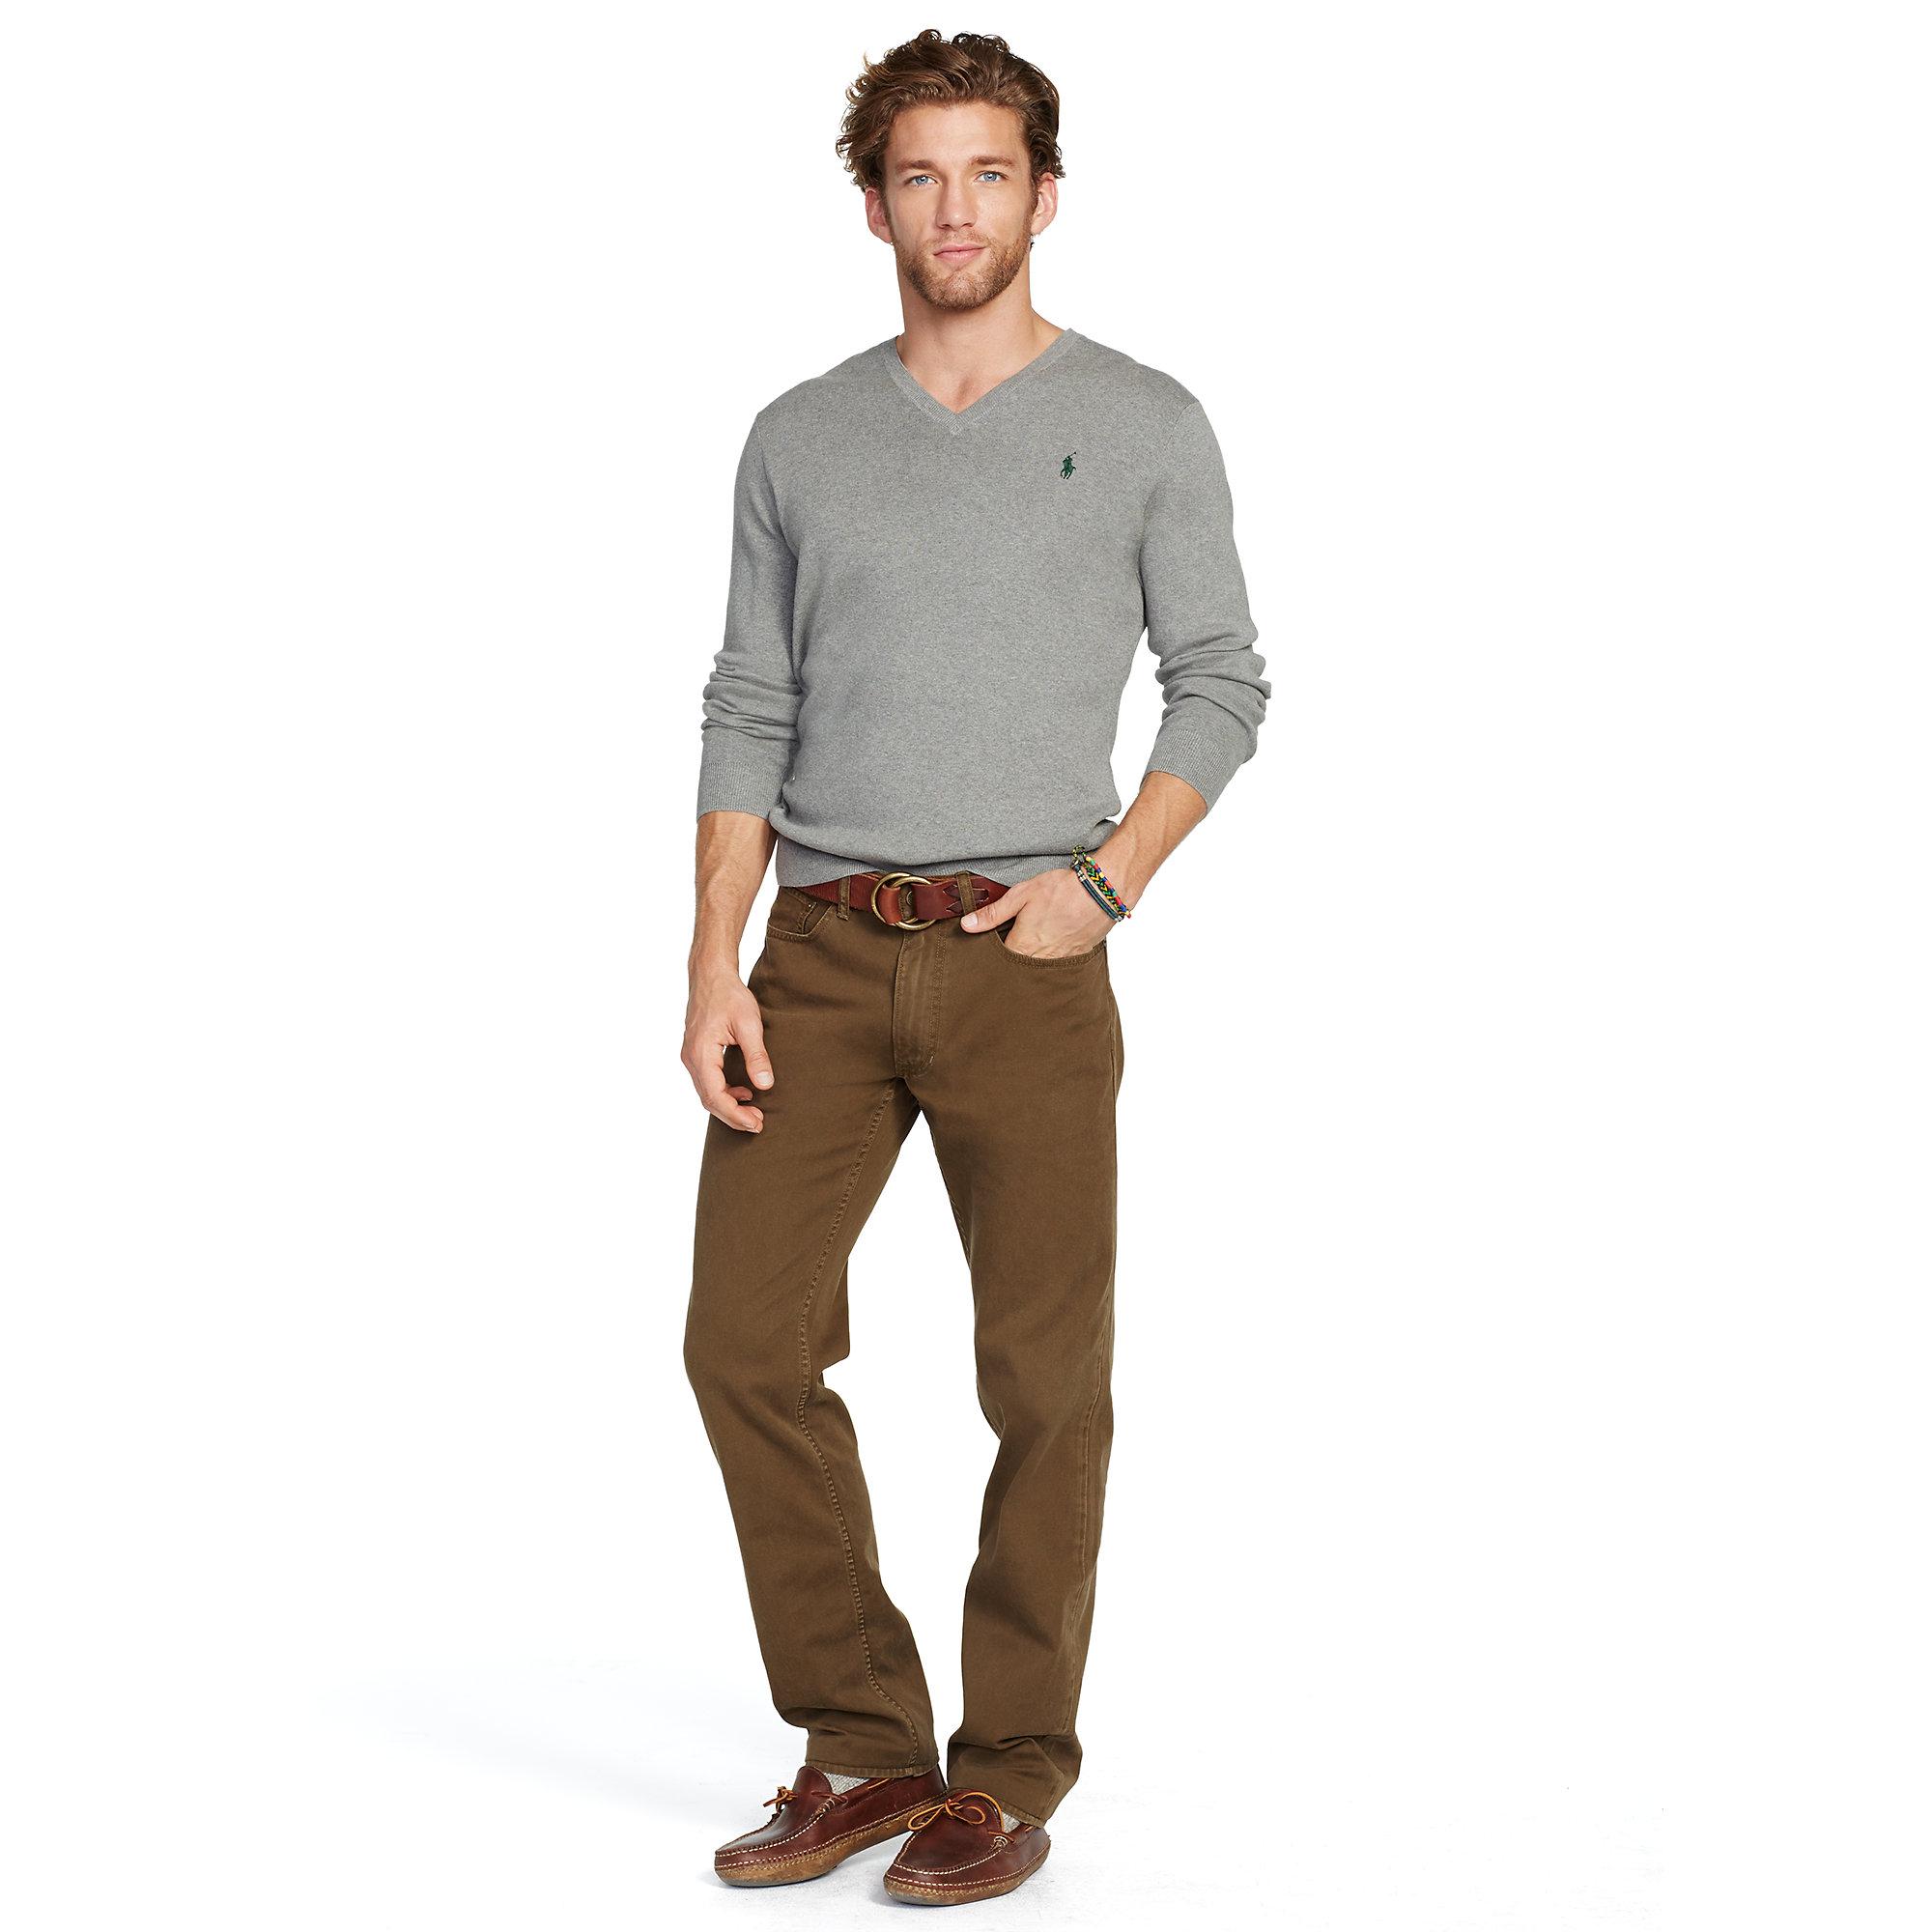 Ralph For Polo Lauren Jeans Men Mens orBCexdW